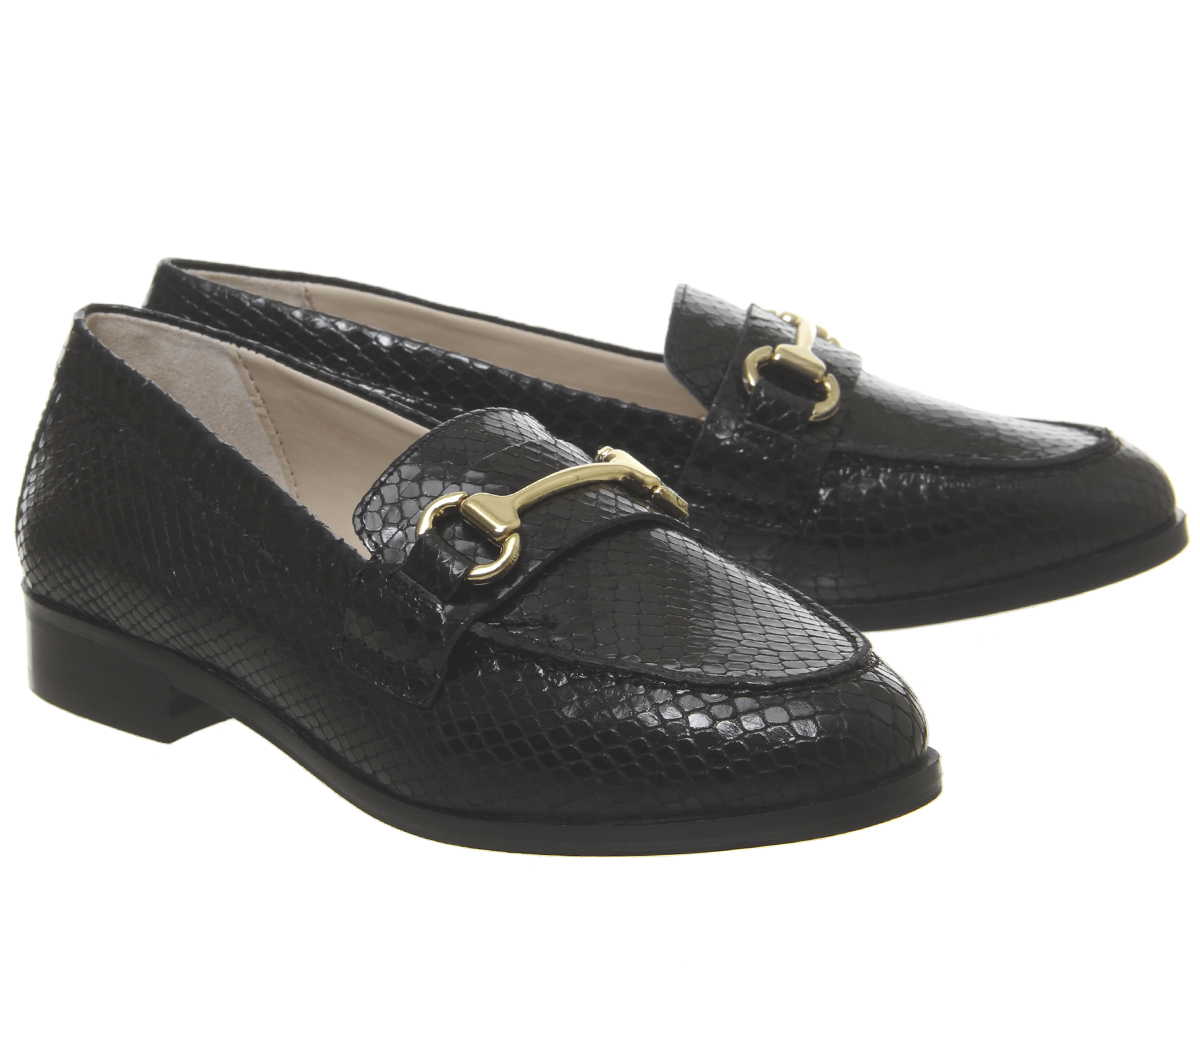 ea877c44345d6 SENTINELLE Womens bureau émoi mocassins serpent noir cuir Flats